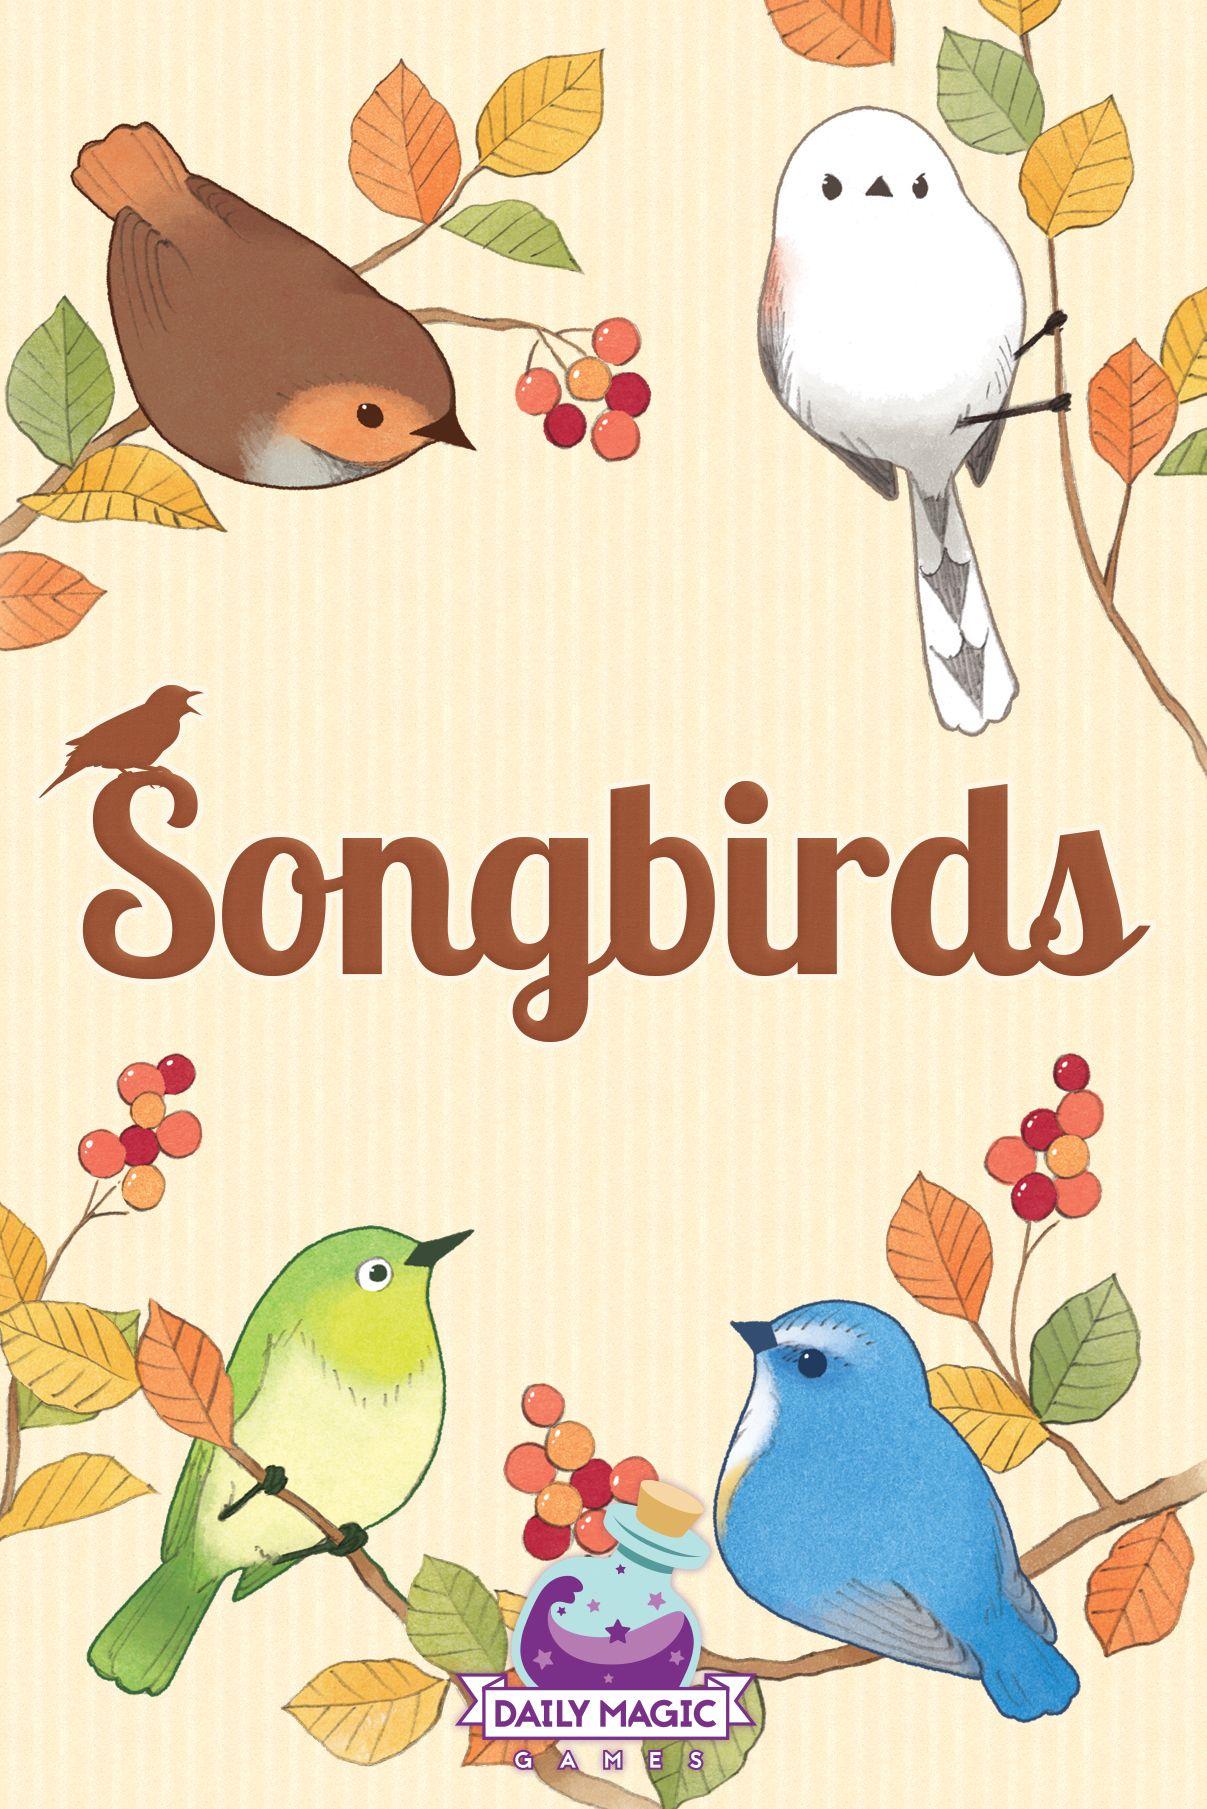 Cover Songbirds